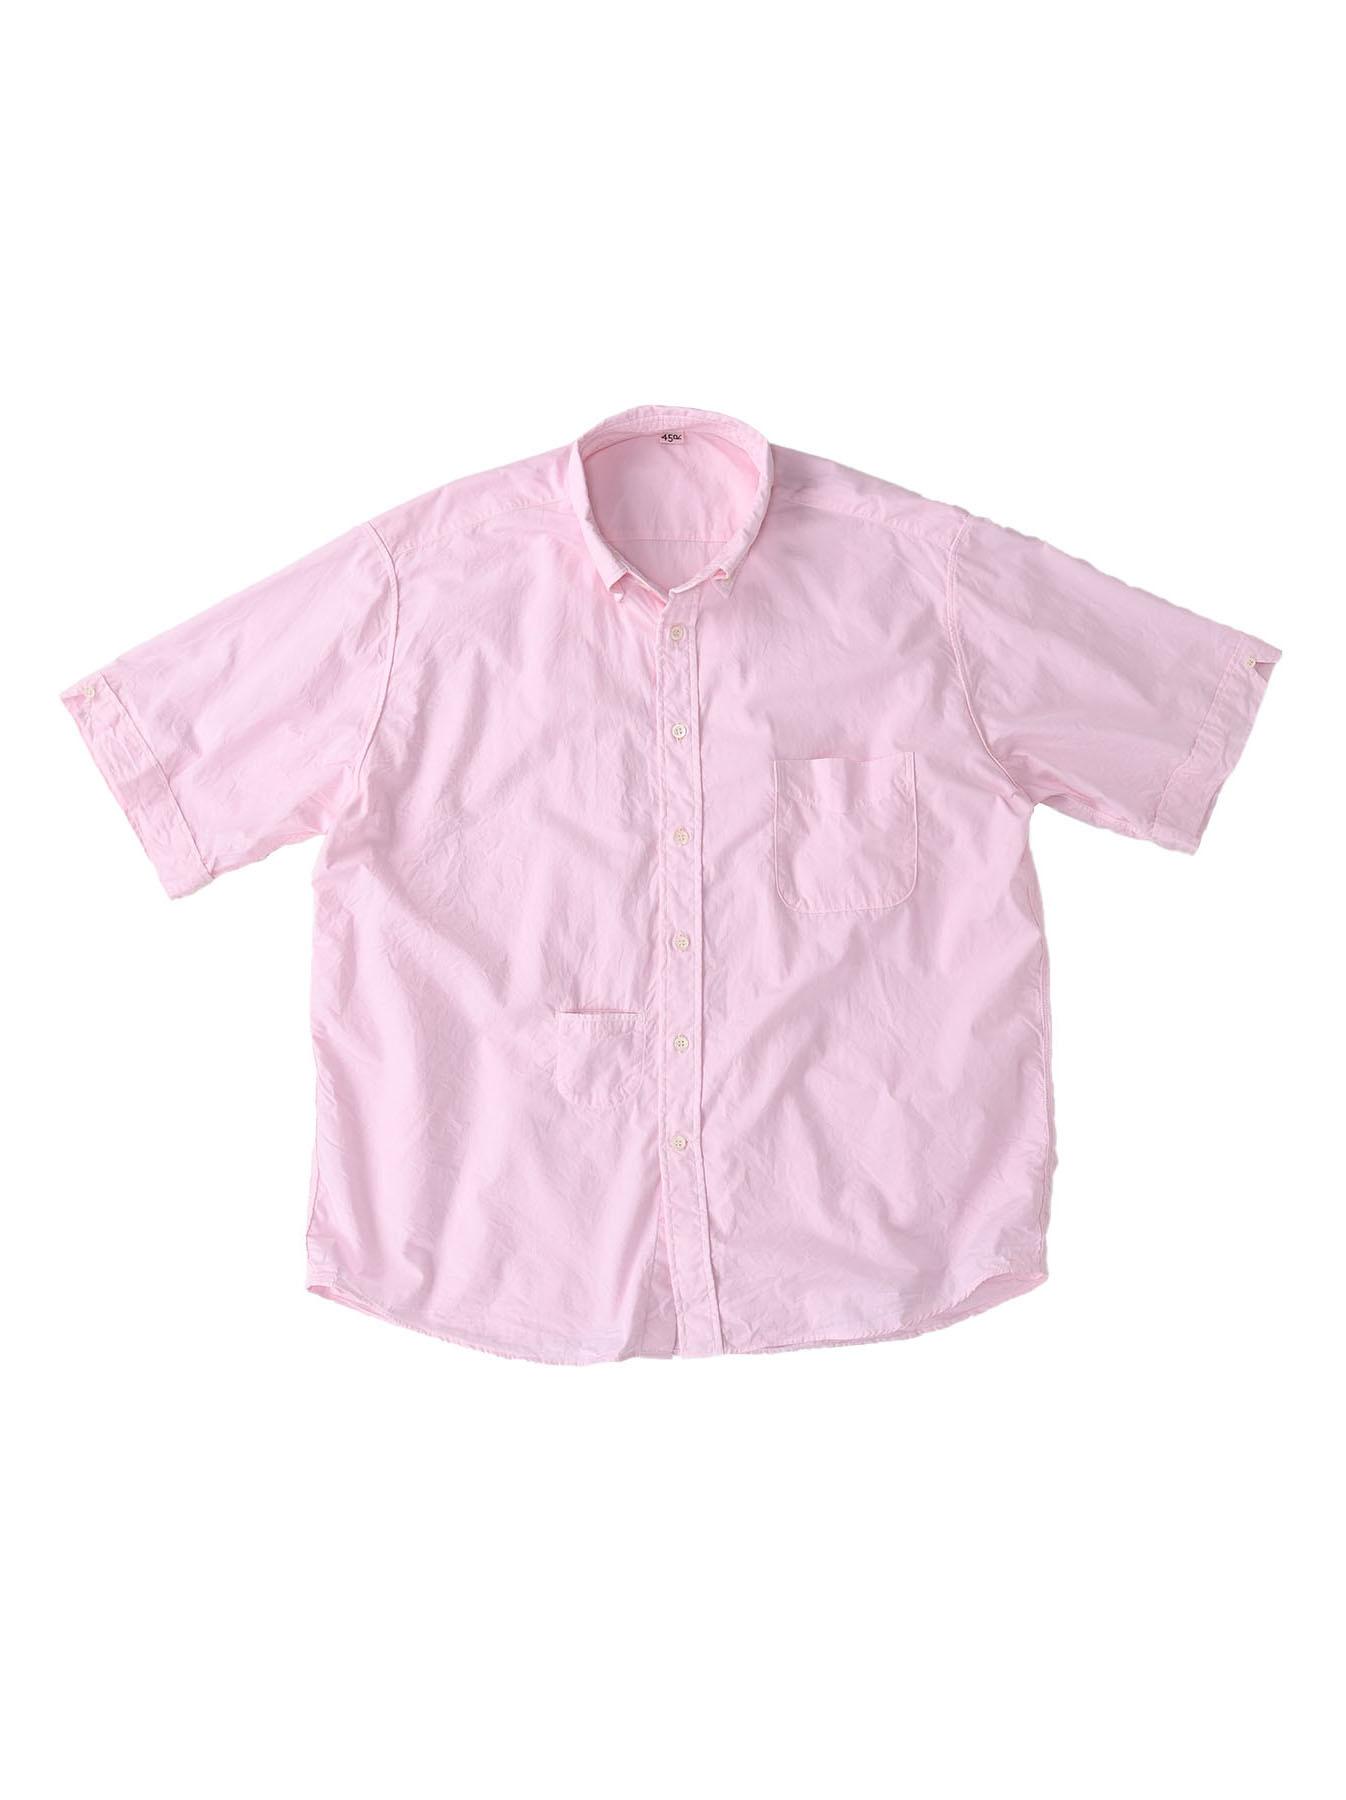 Damp Cotton Anuenue Ocean Shirt (0621)-1